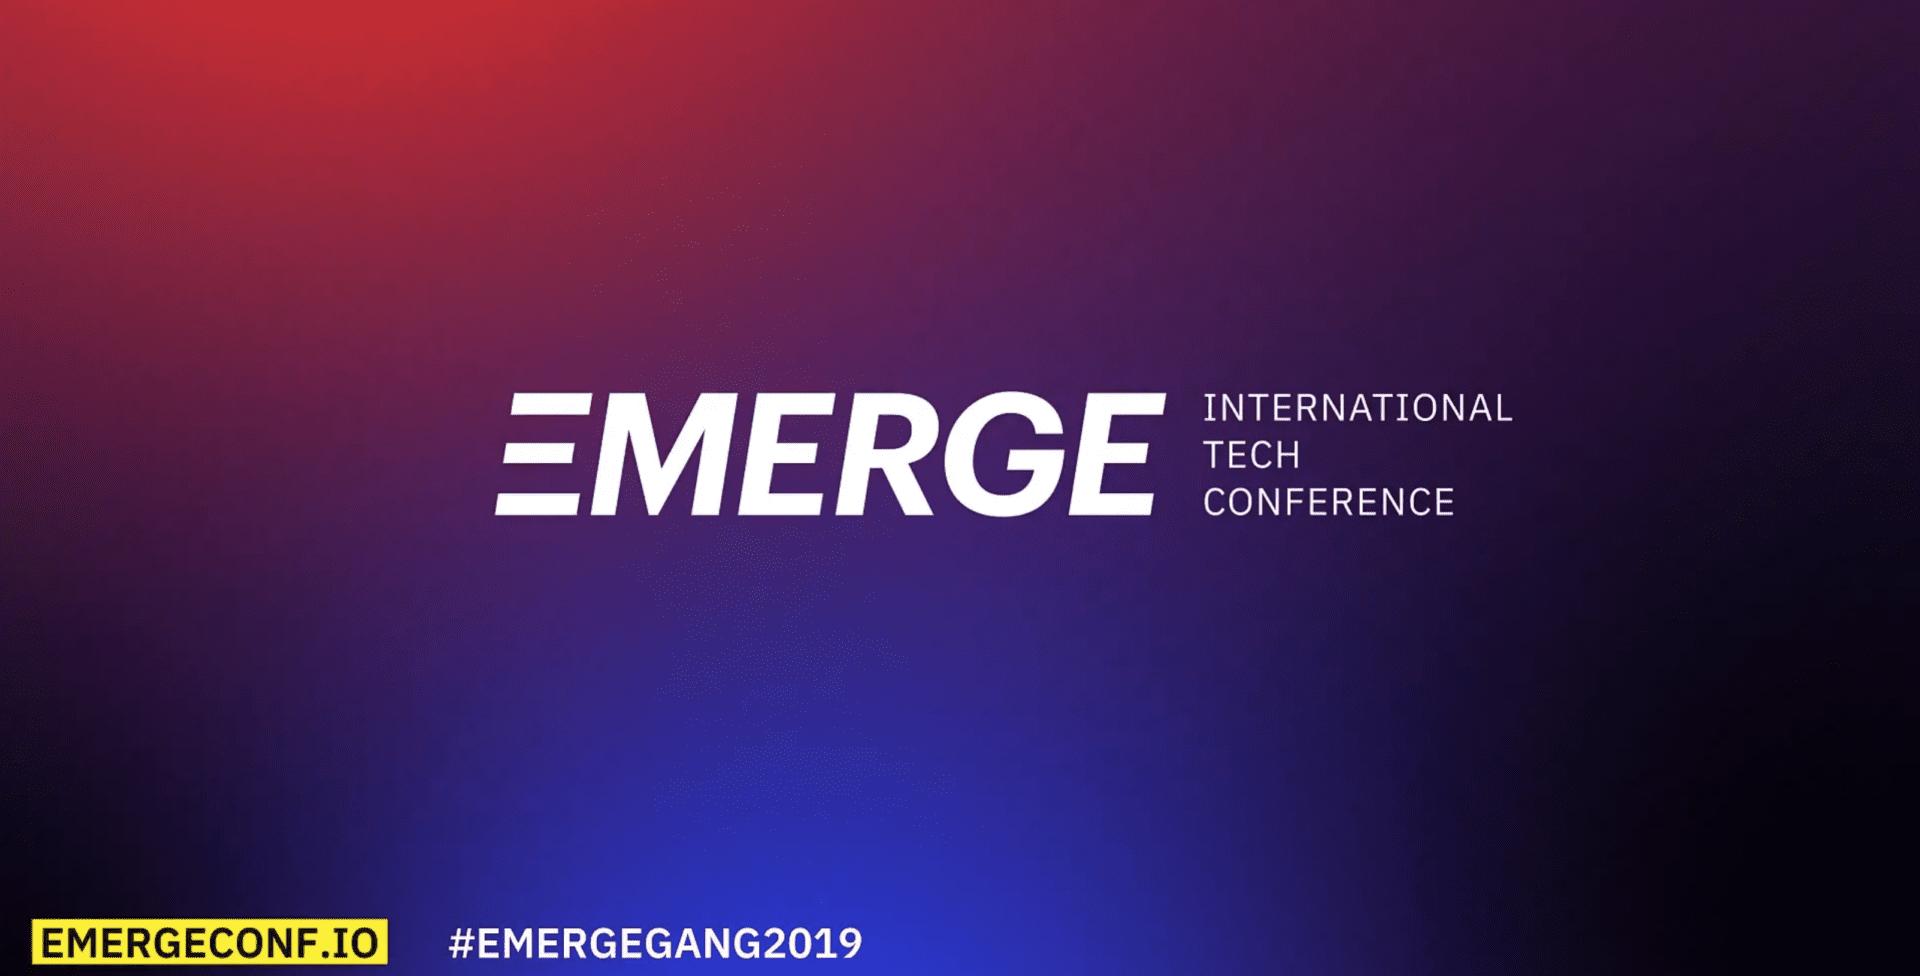 Emerge event promo